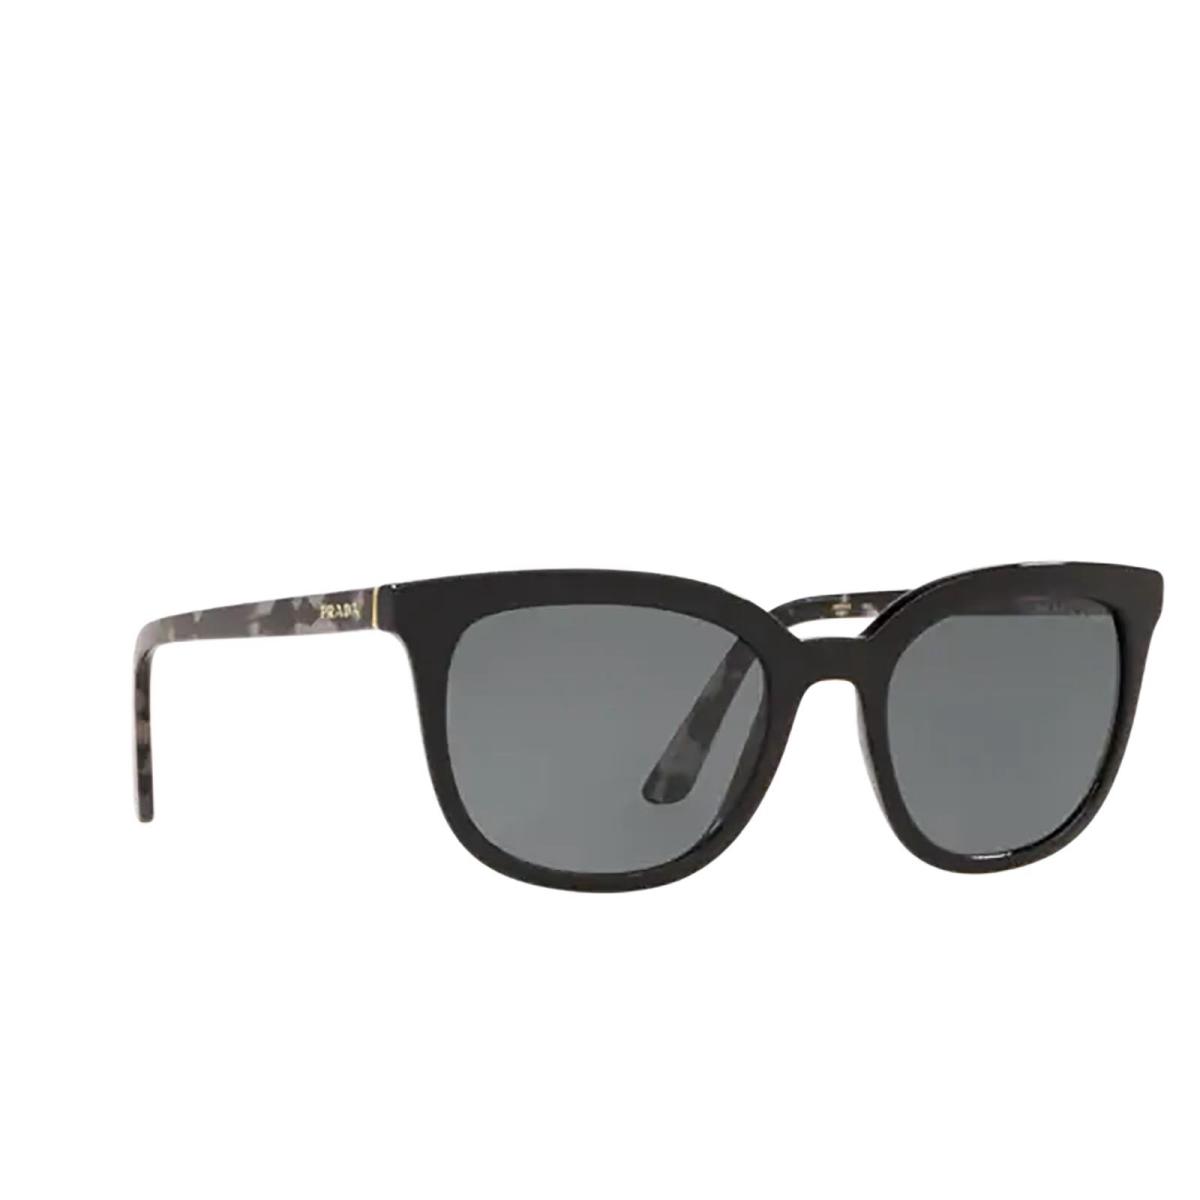 Prada® Square Sunglasses: PR 03XS color Black 1AB5Z1.